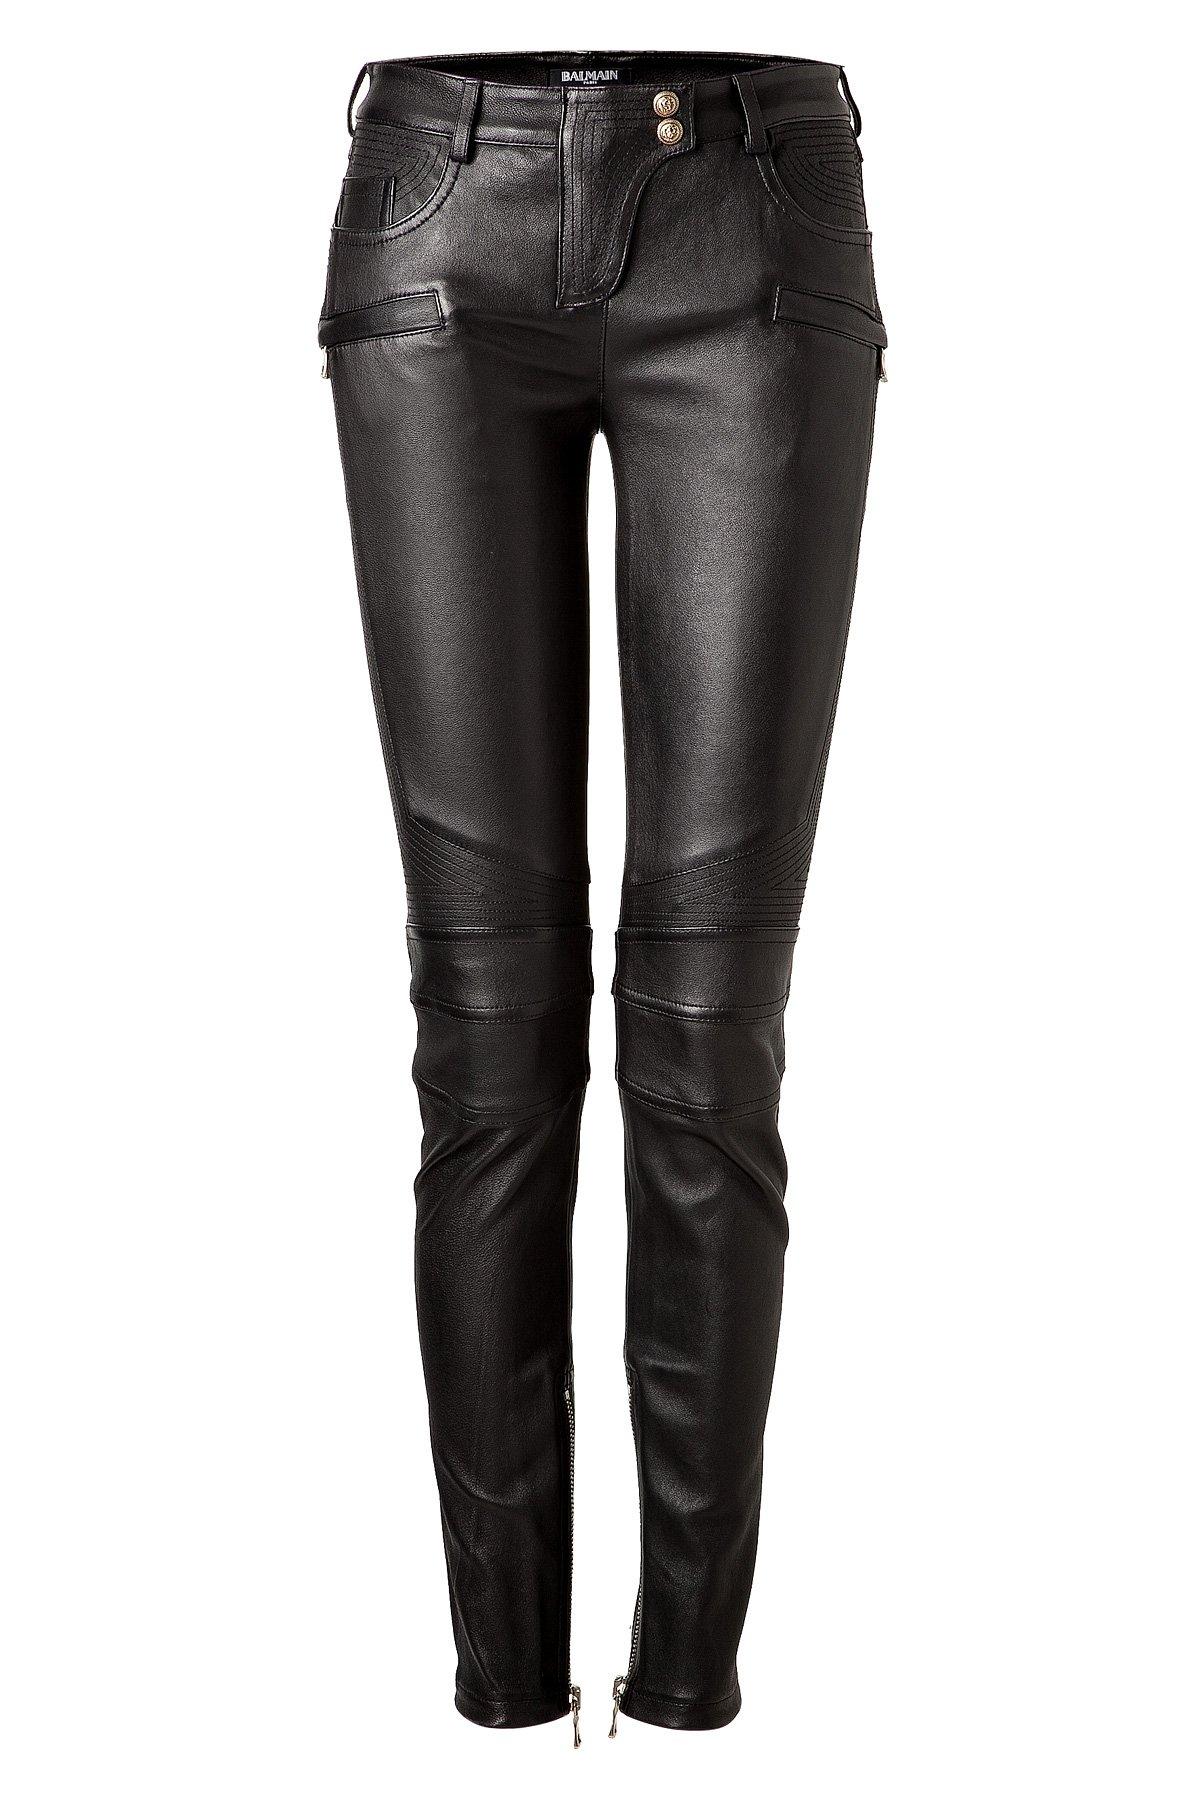 Lyst Balmain Leather Biker Pants Black In Black